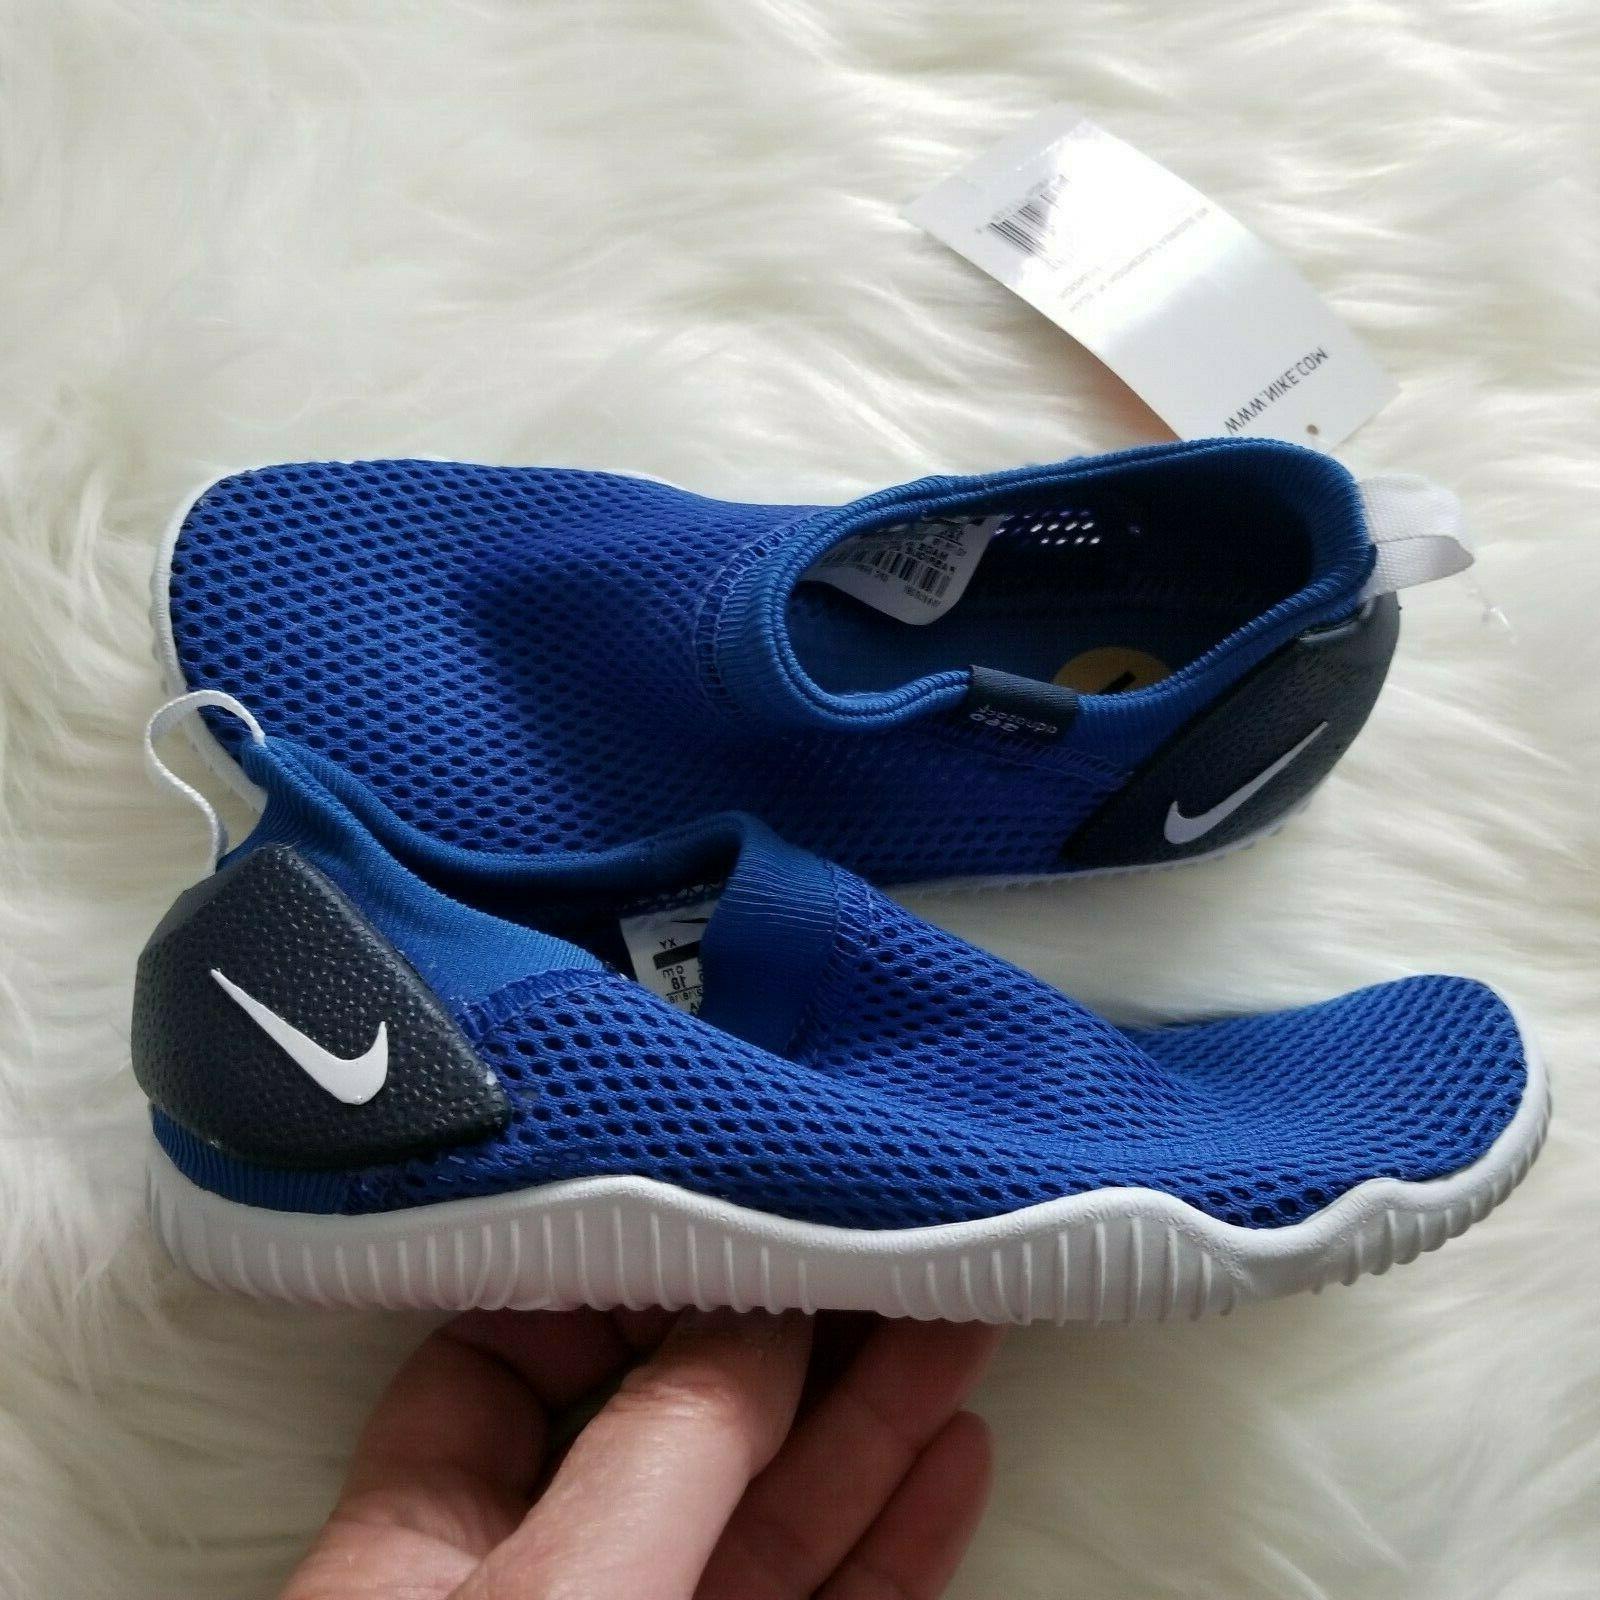 NWT $50 NIKE Aqua Sock Shoes SELECT SIZE COLOR